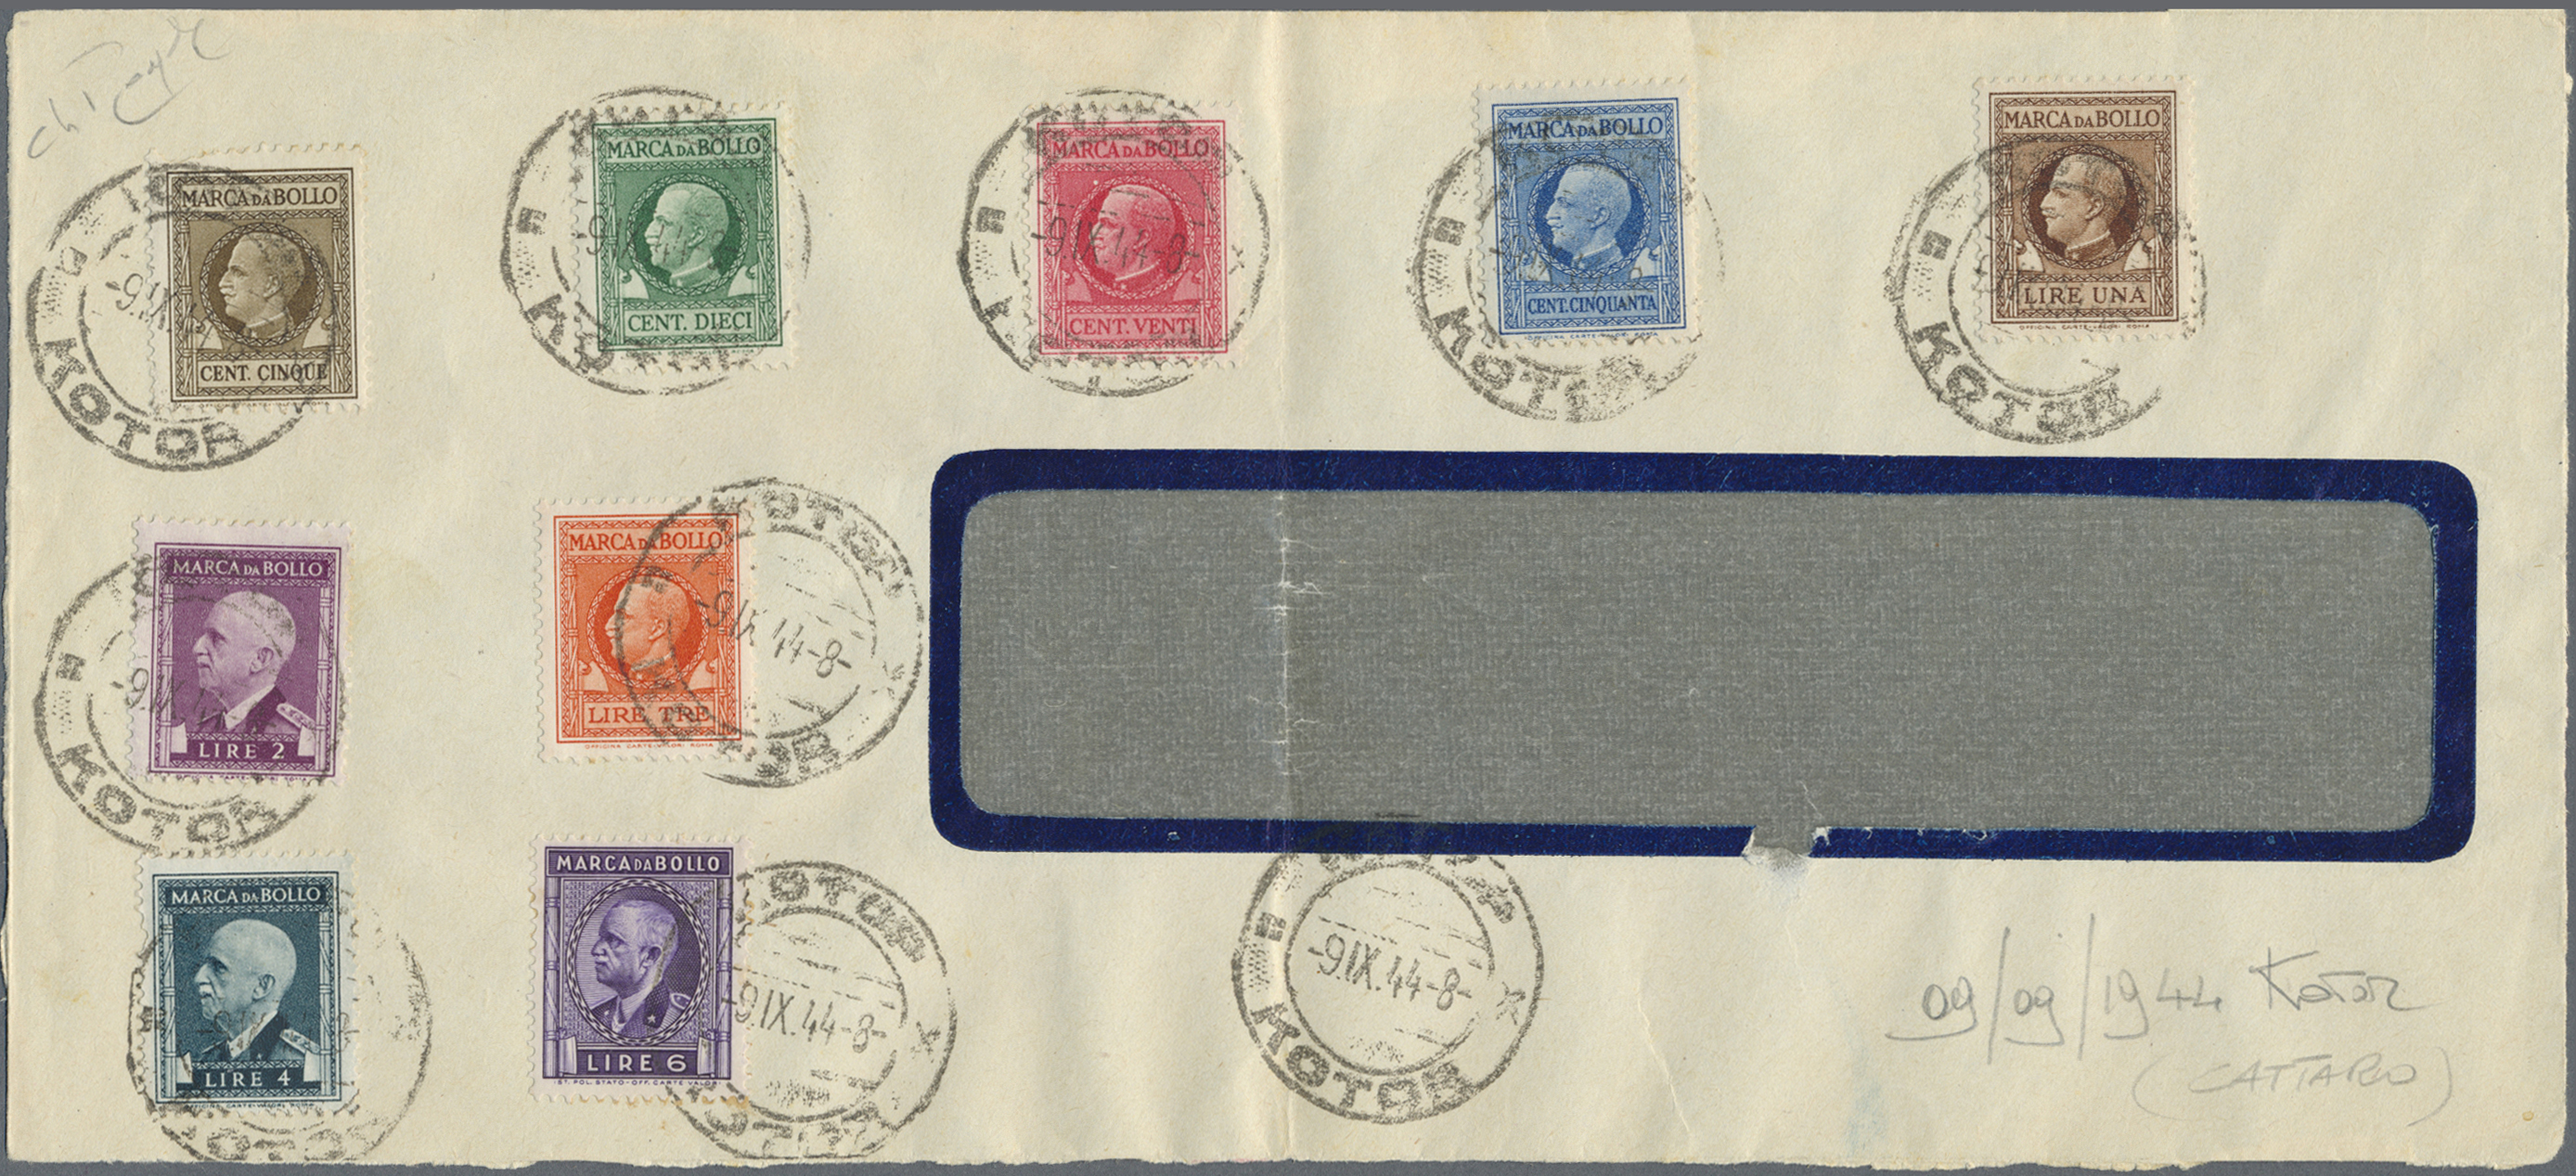 Lot 17126 - Italien - Verrechnungsmarken  -  Auktionshaus Christoph Gärtner GmbH & Co. KG Single lots Philately Overseas & Europe. Auction #39 Day 4